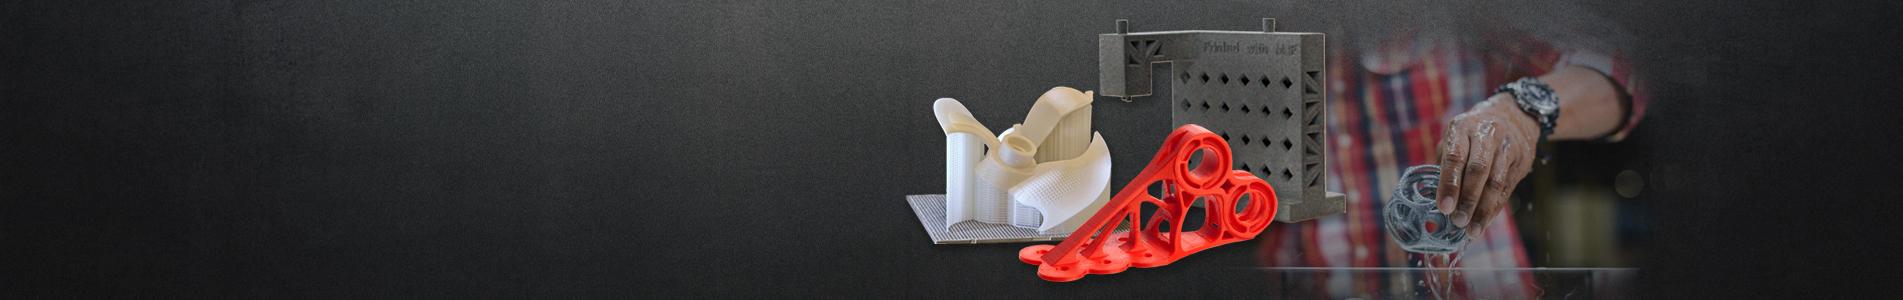 EMS_Banner_3DPrinting_HP2